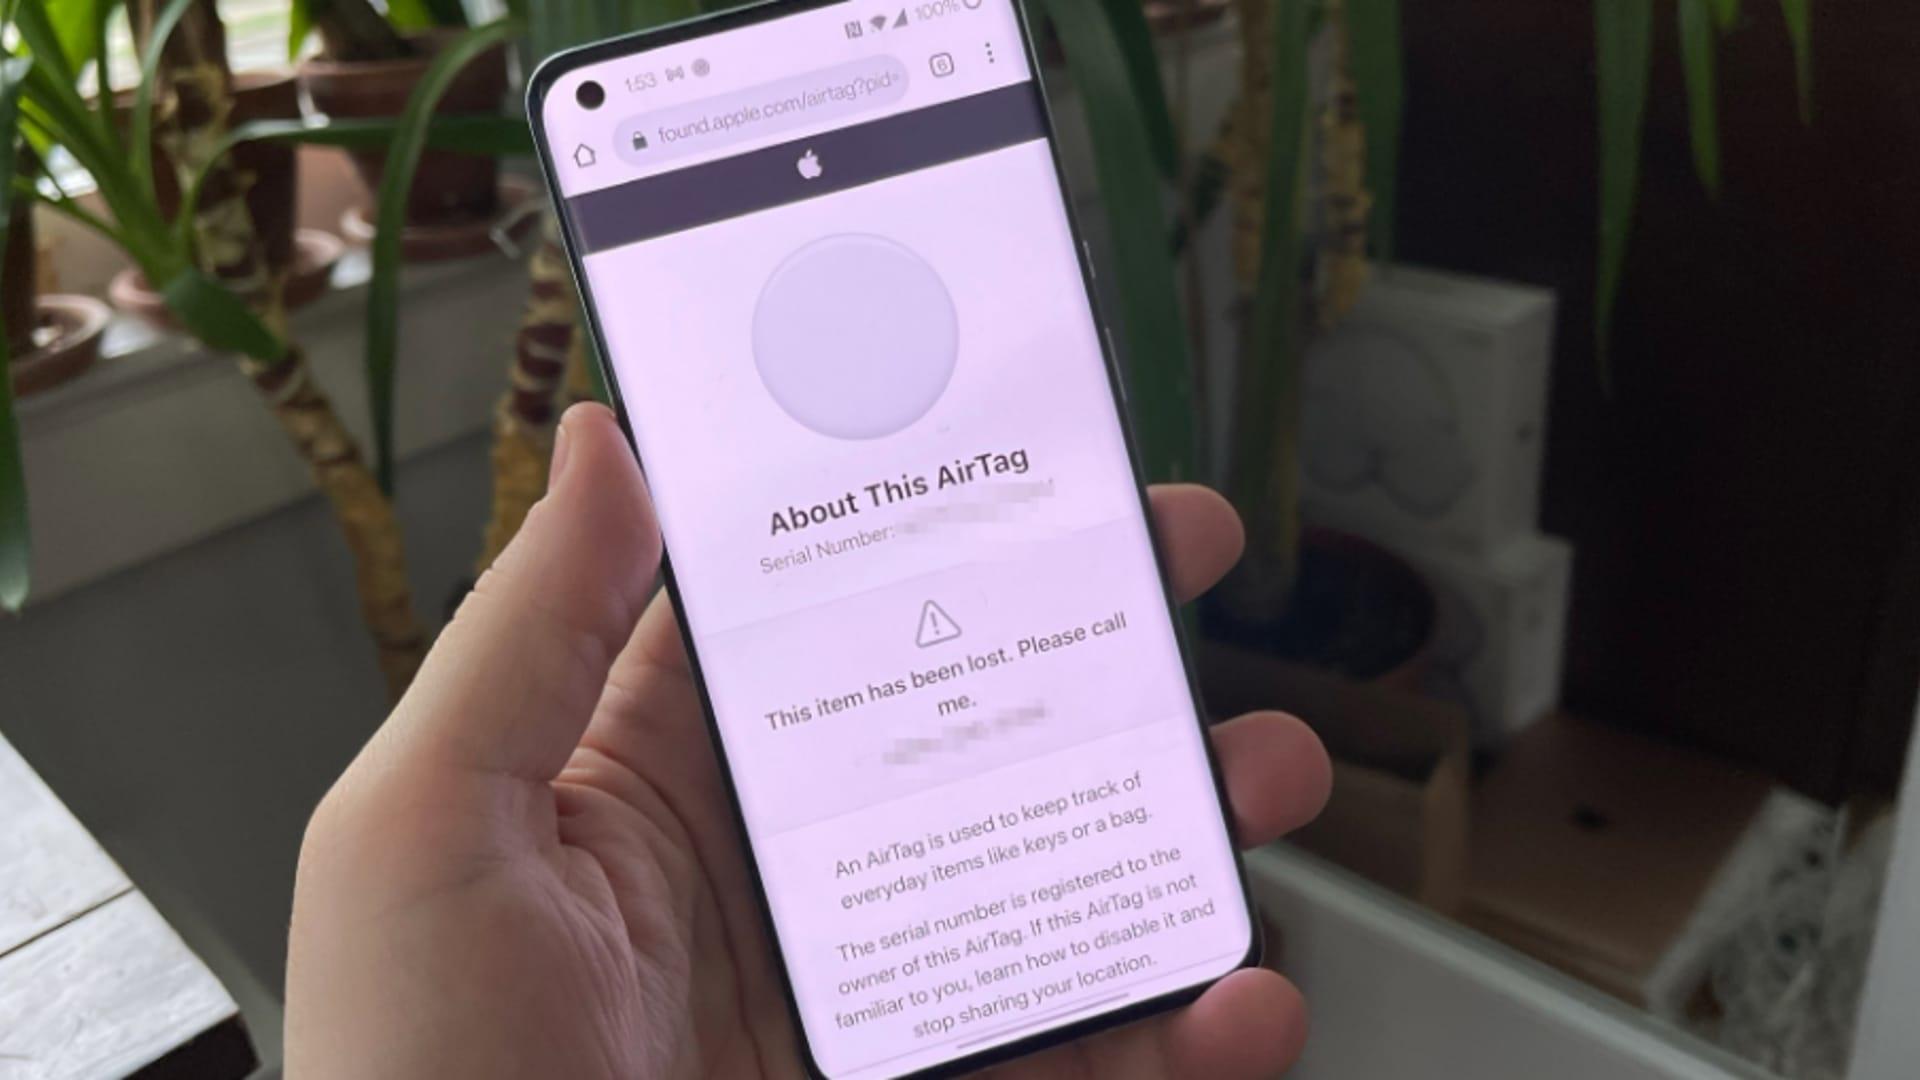 An Android phone can also help retrieve a lost AirTag.